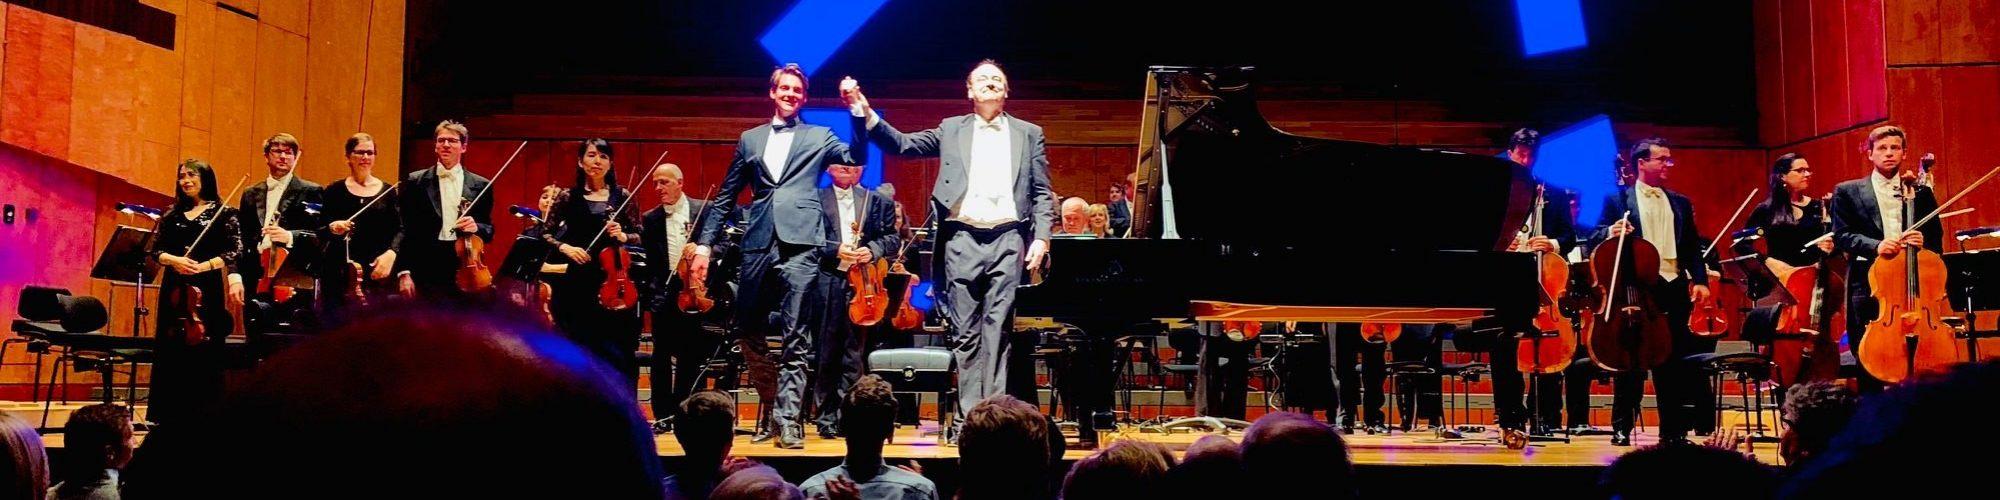 Maximilian Schairer © KKL Liederhalle ● Stuttgarter Philharmoniker mit Jan Willem de Vriend 2019